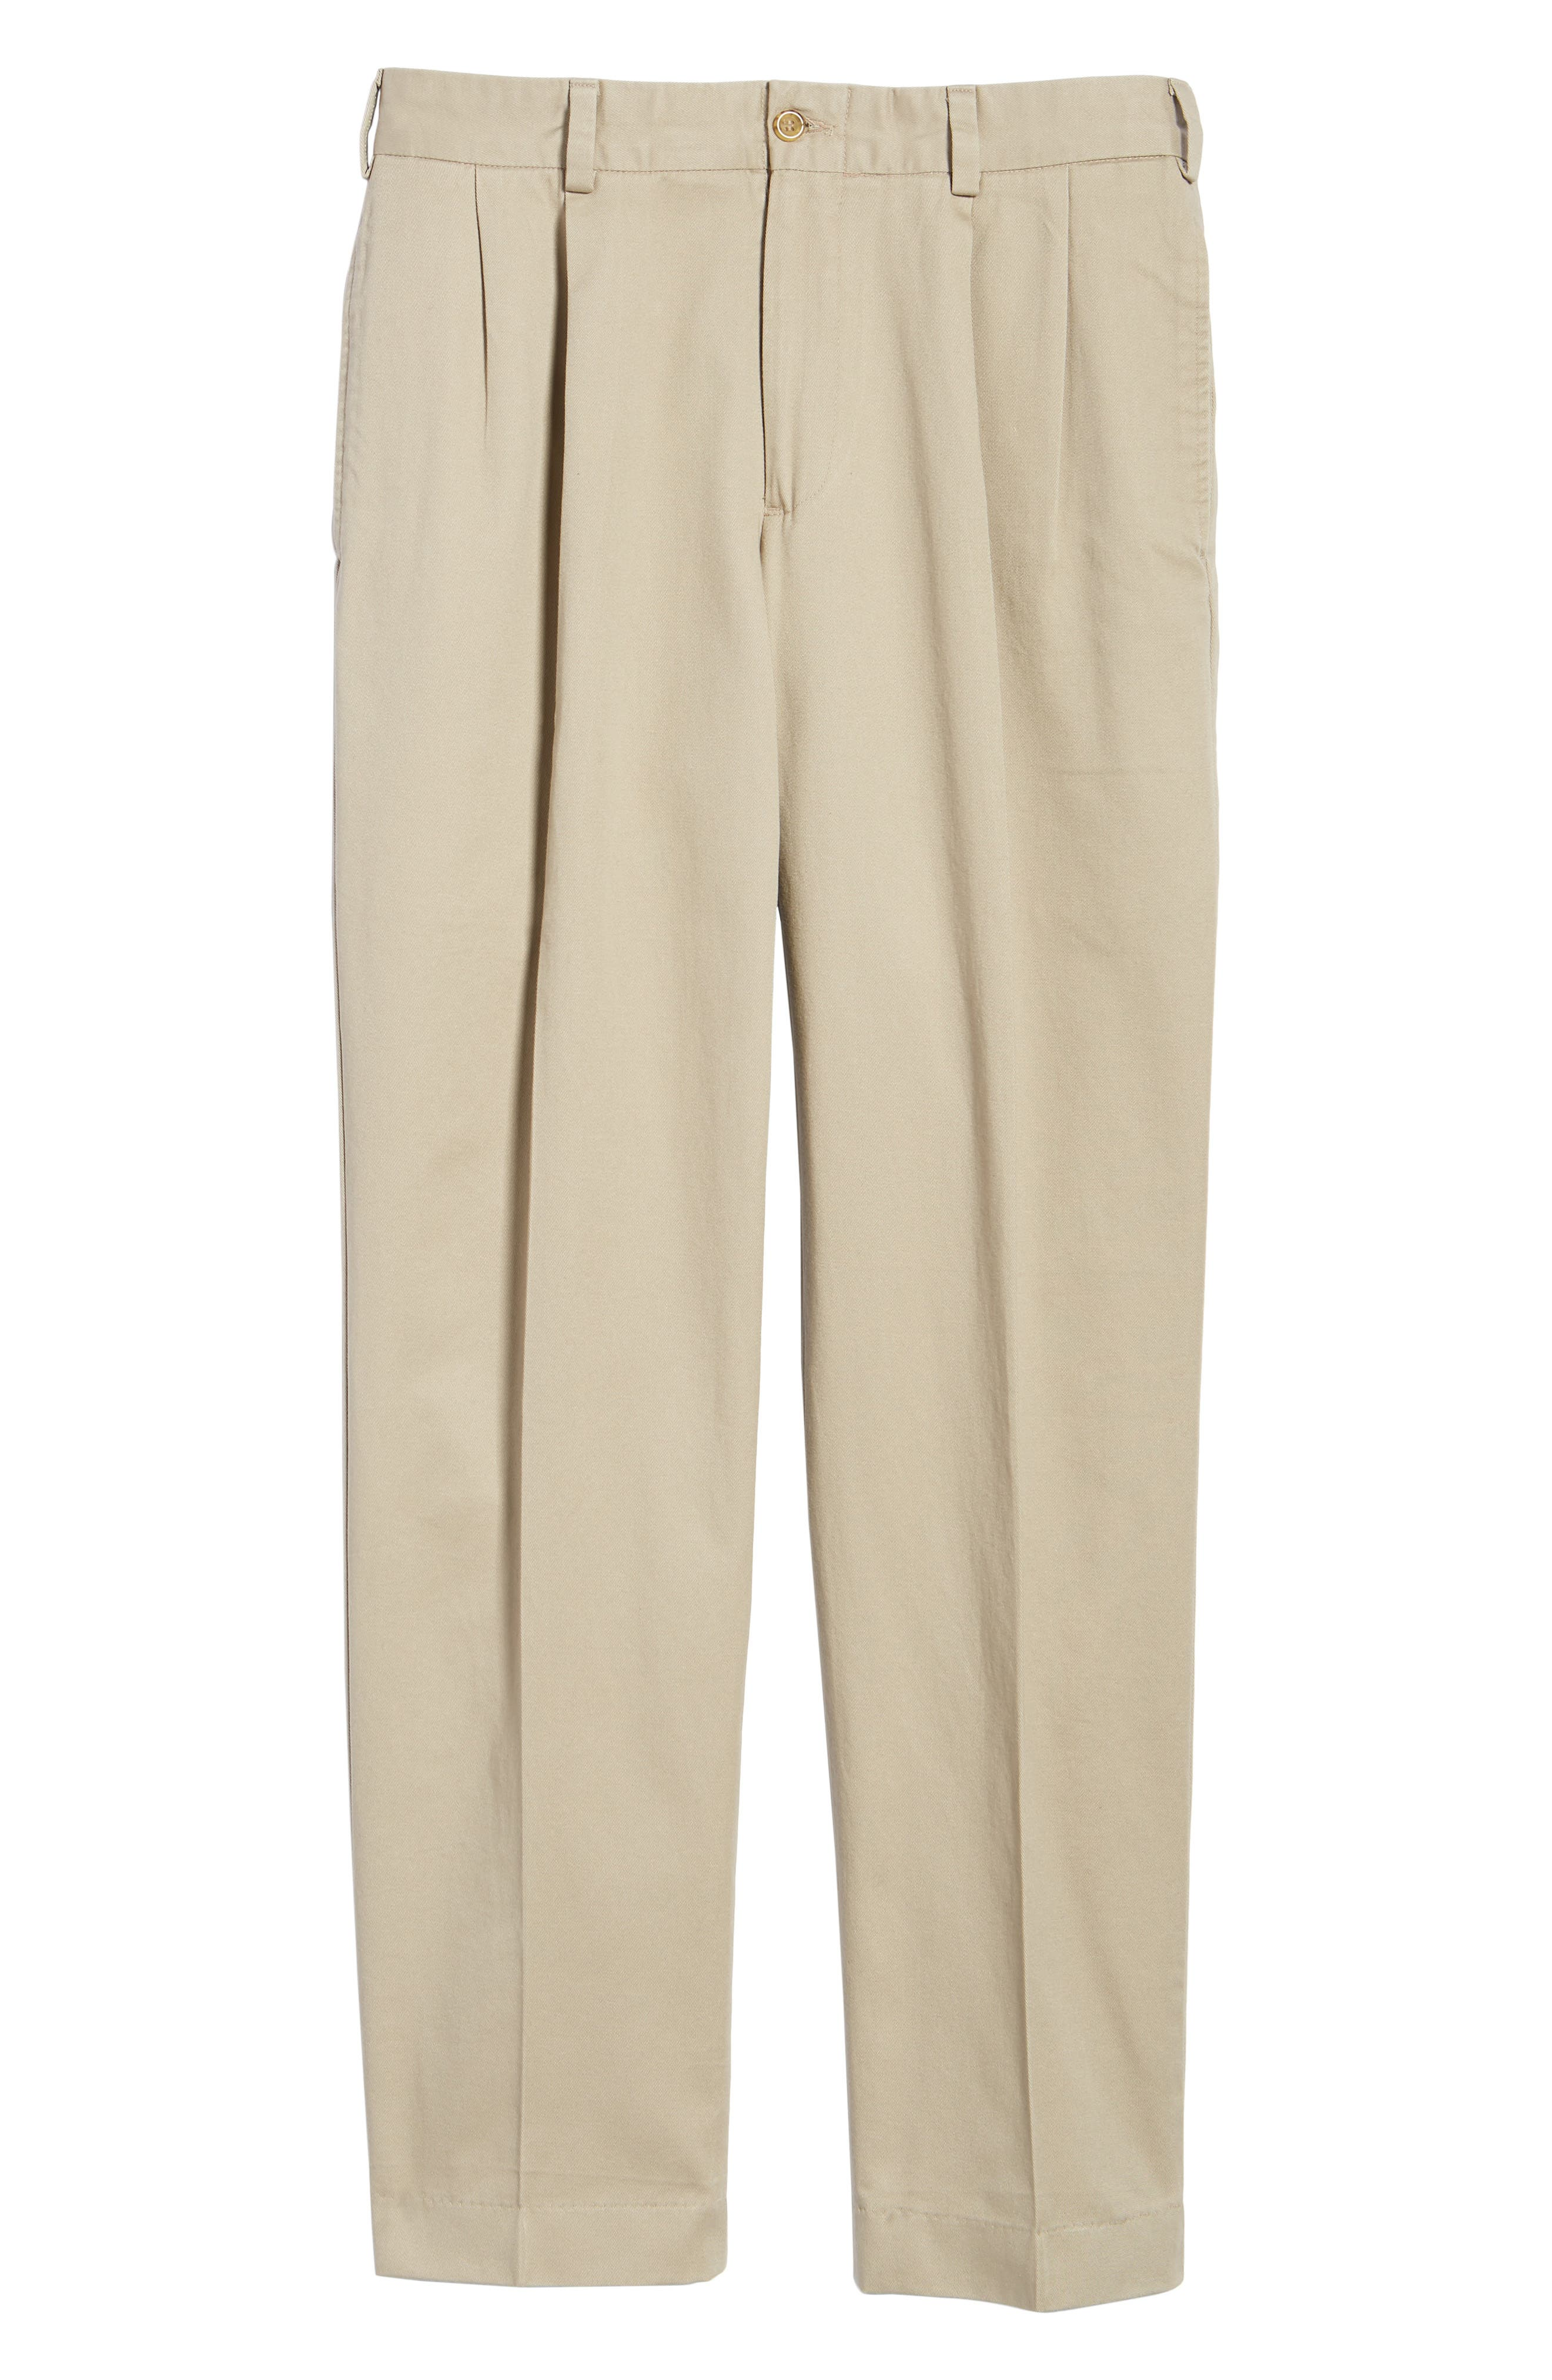 M2 Classic Fit Pleated Vintage Twill Pants,                         Main,                         color, Khaki